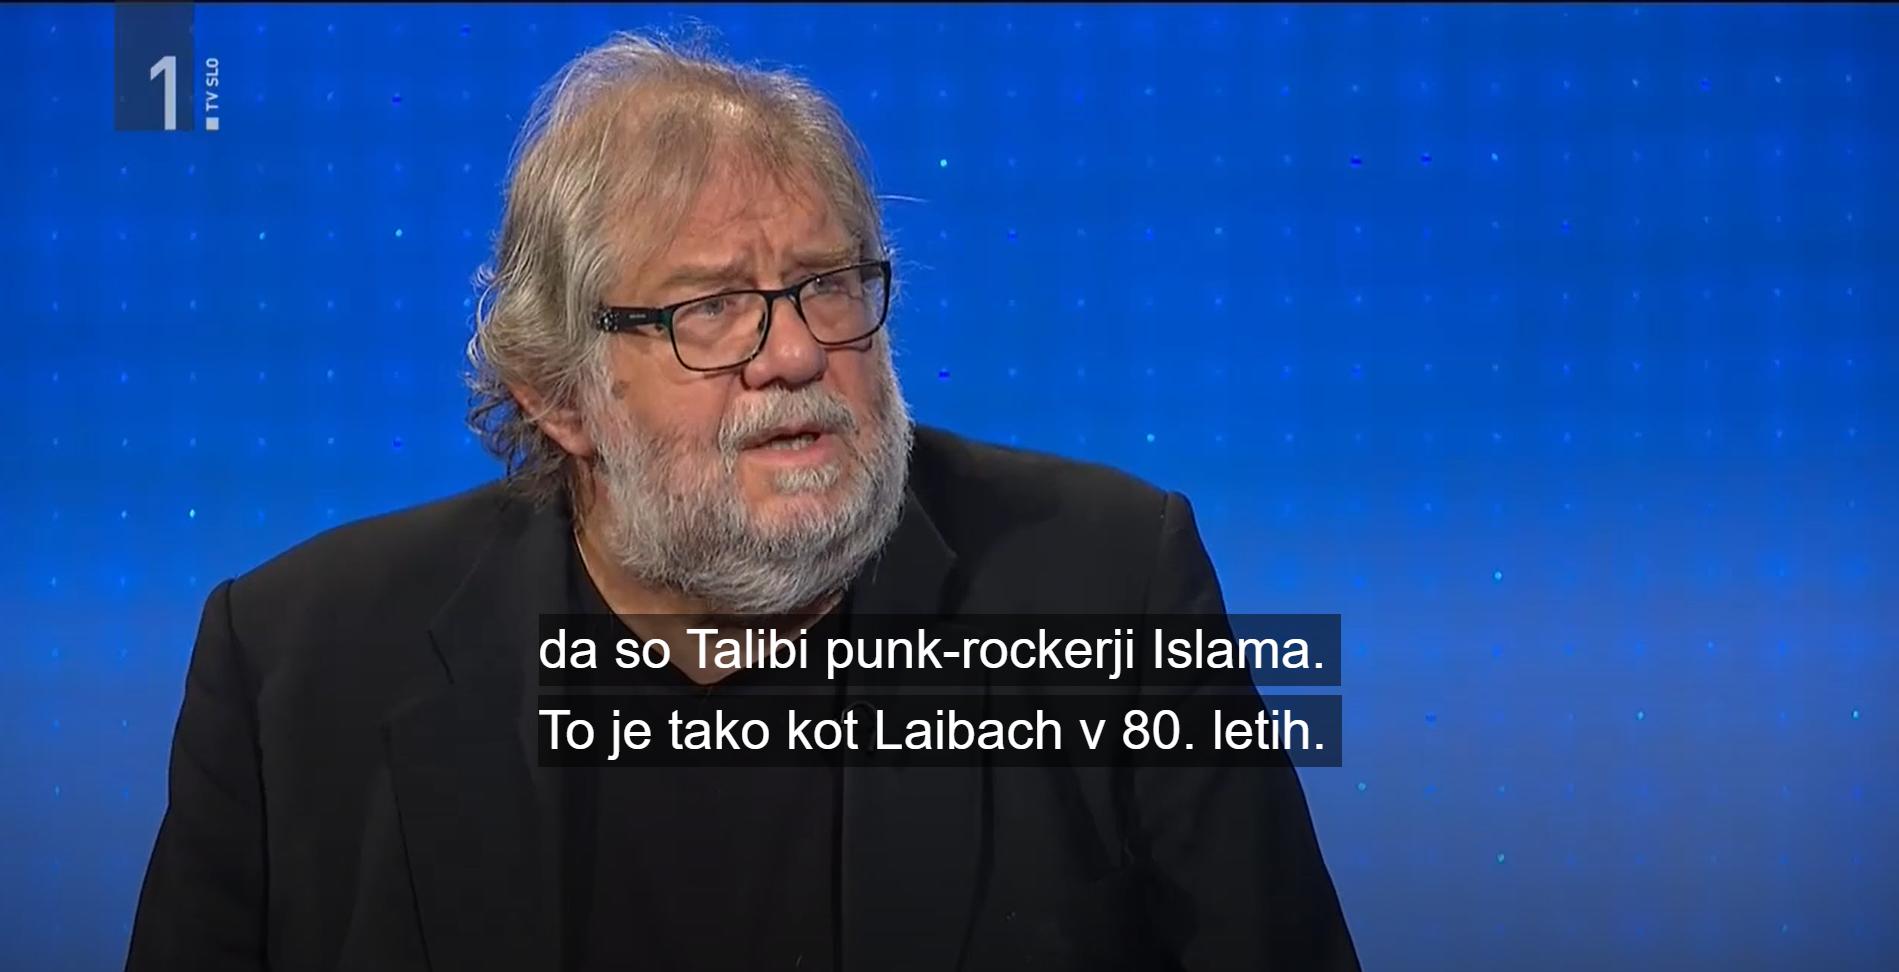 Ervin Hladnik-Milharčič  Vir: Posnetek zaslona